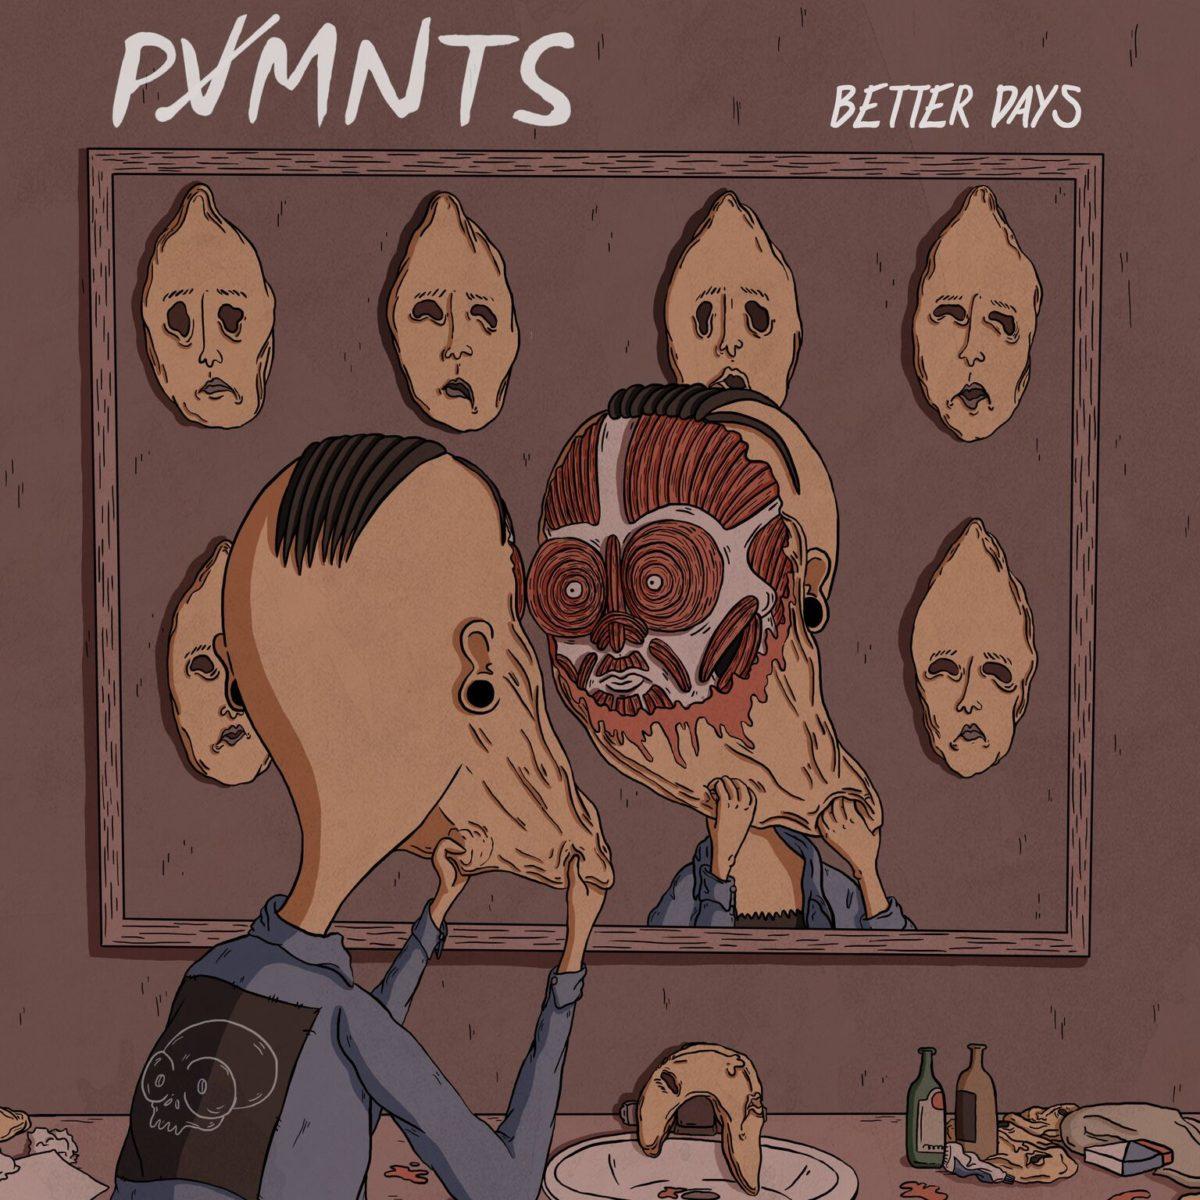 PVMNTS BETTER DAYS